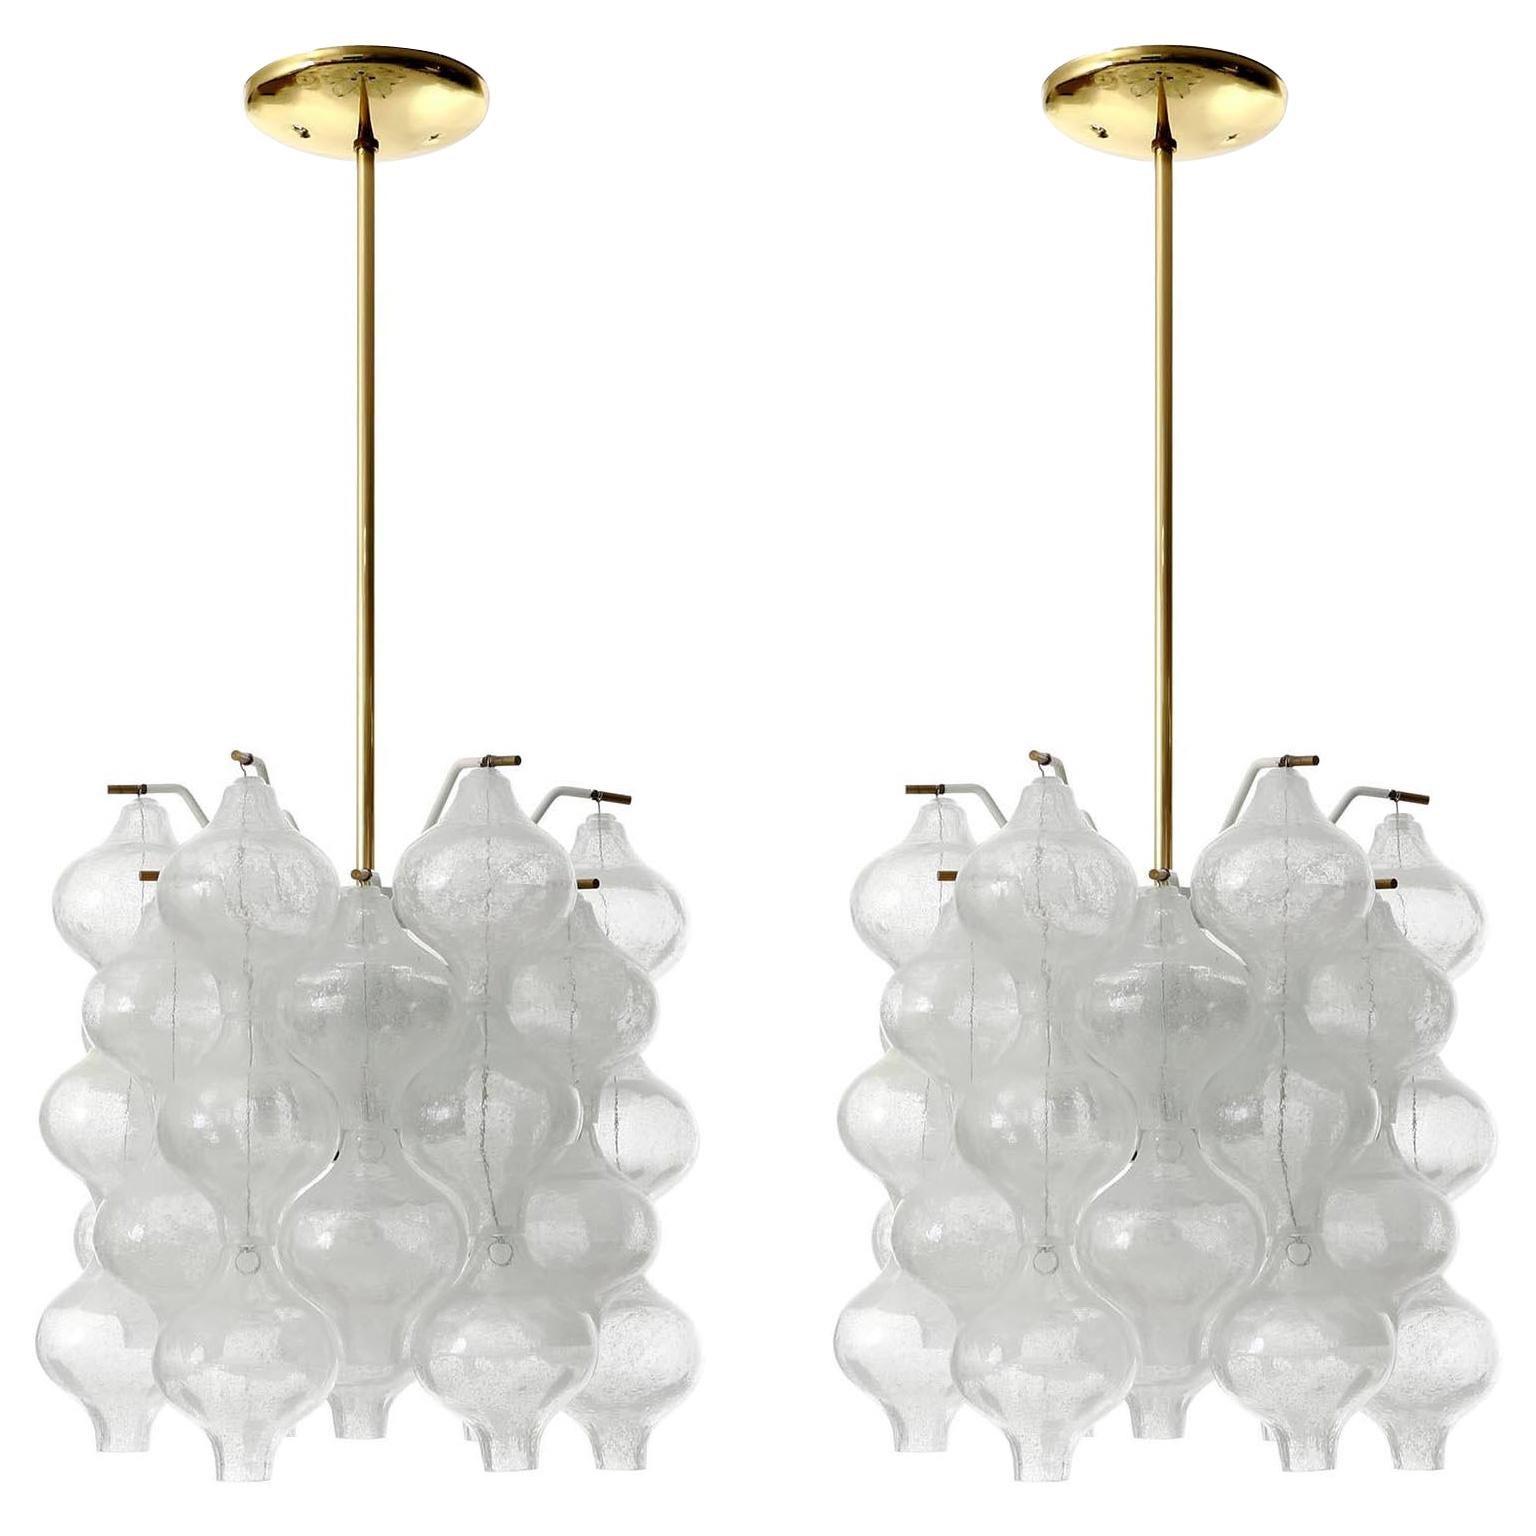 One of Two Kalmar 'Tulipan' Chandeliers Pendant Lights, Glass Brass, 1970